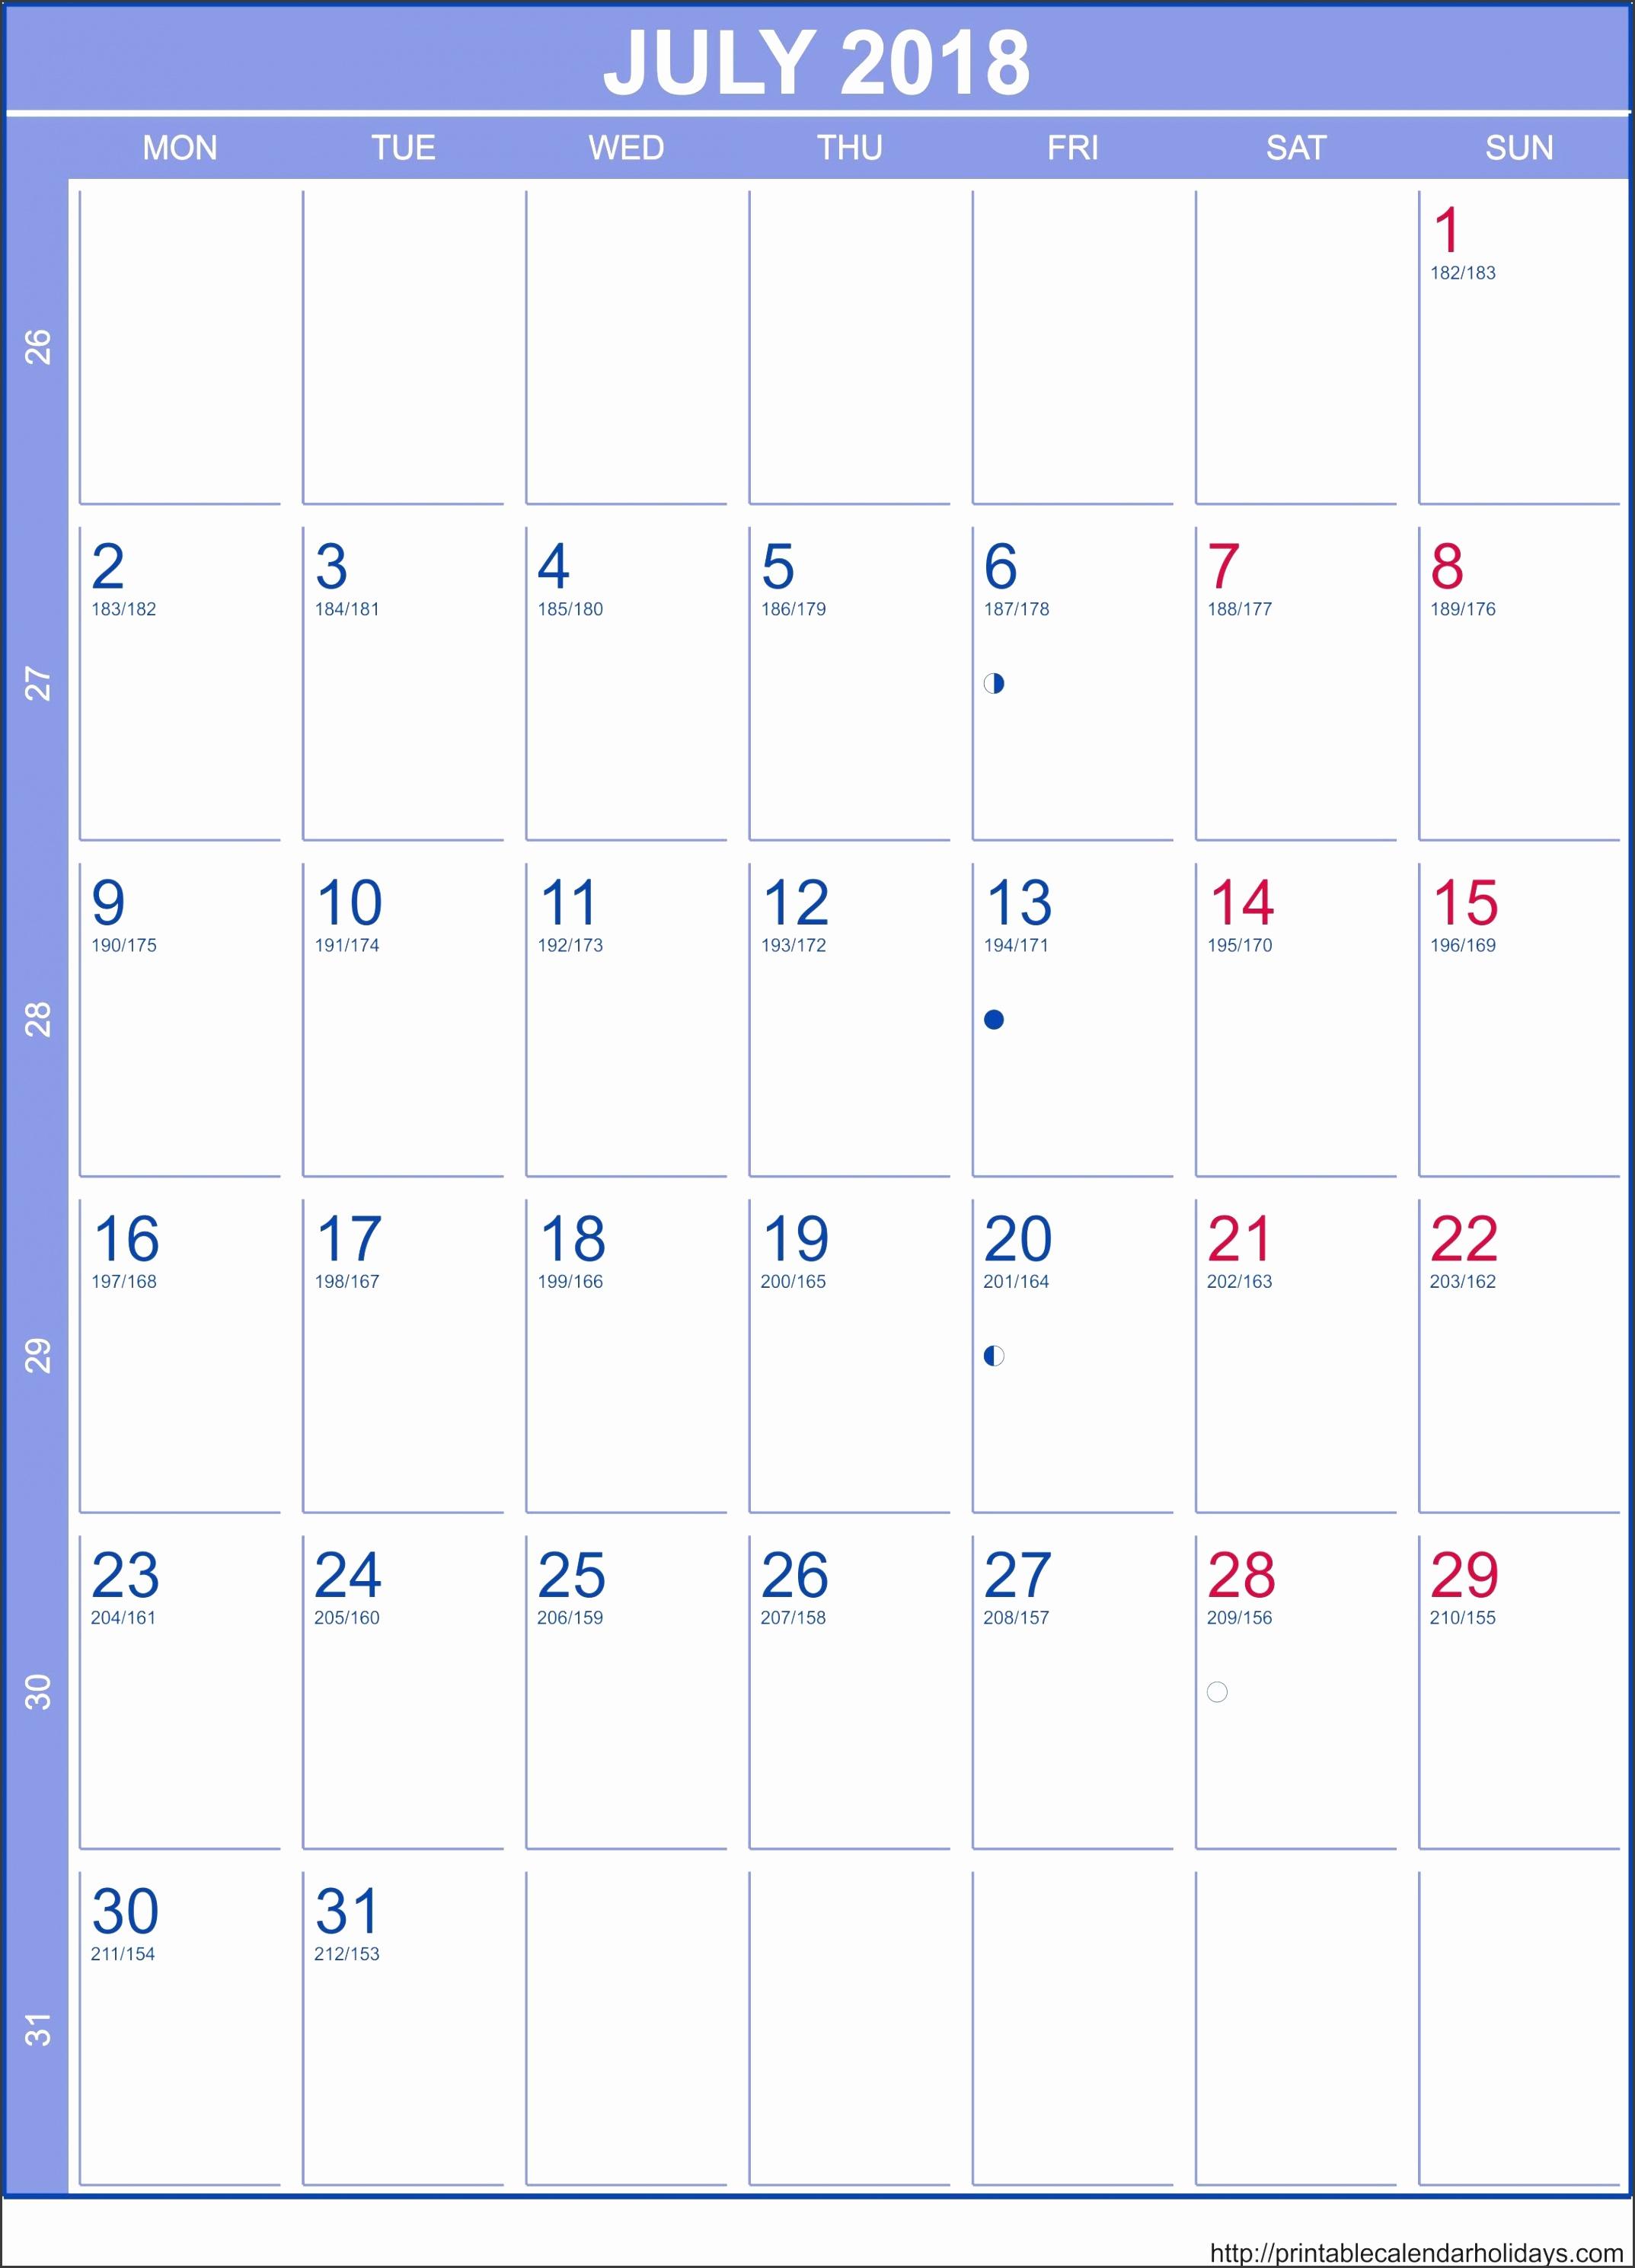 July 2018 Calendar – Template Portrait Printable 2017 Calendar within Printable Calendar July 2018 Portrait